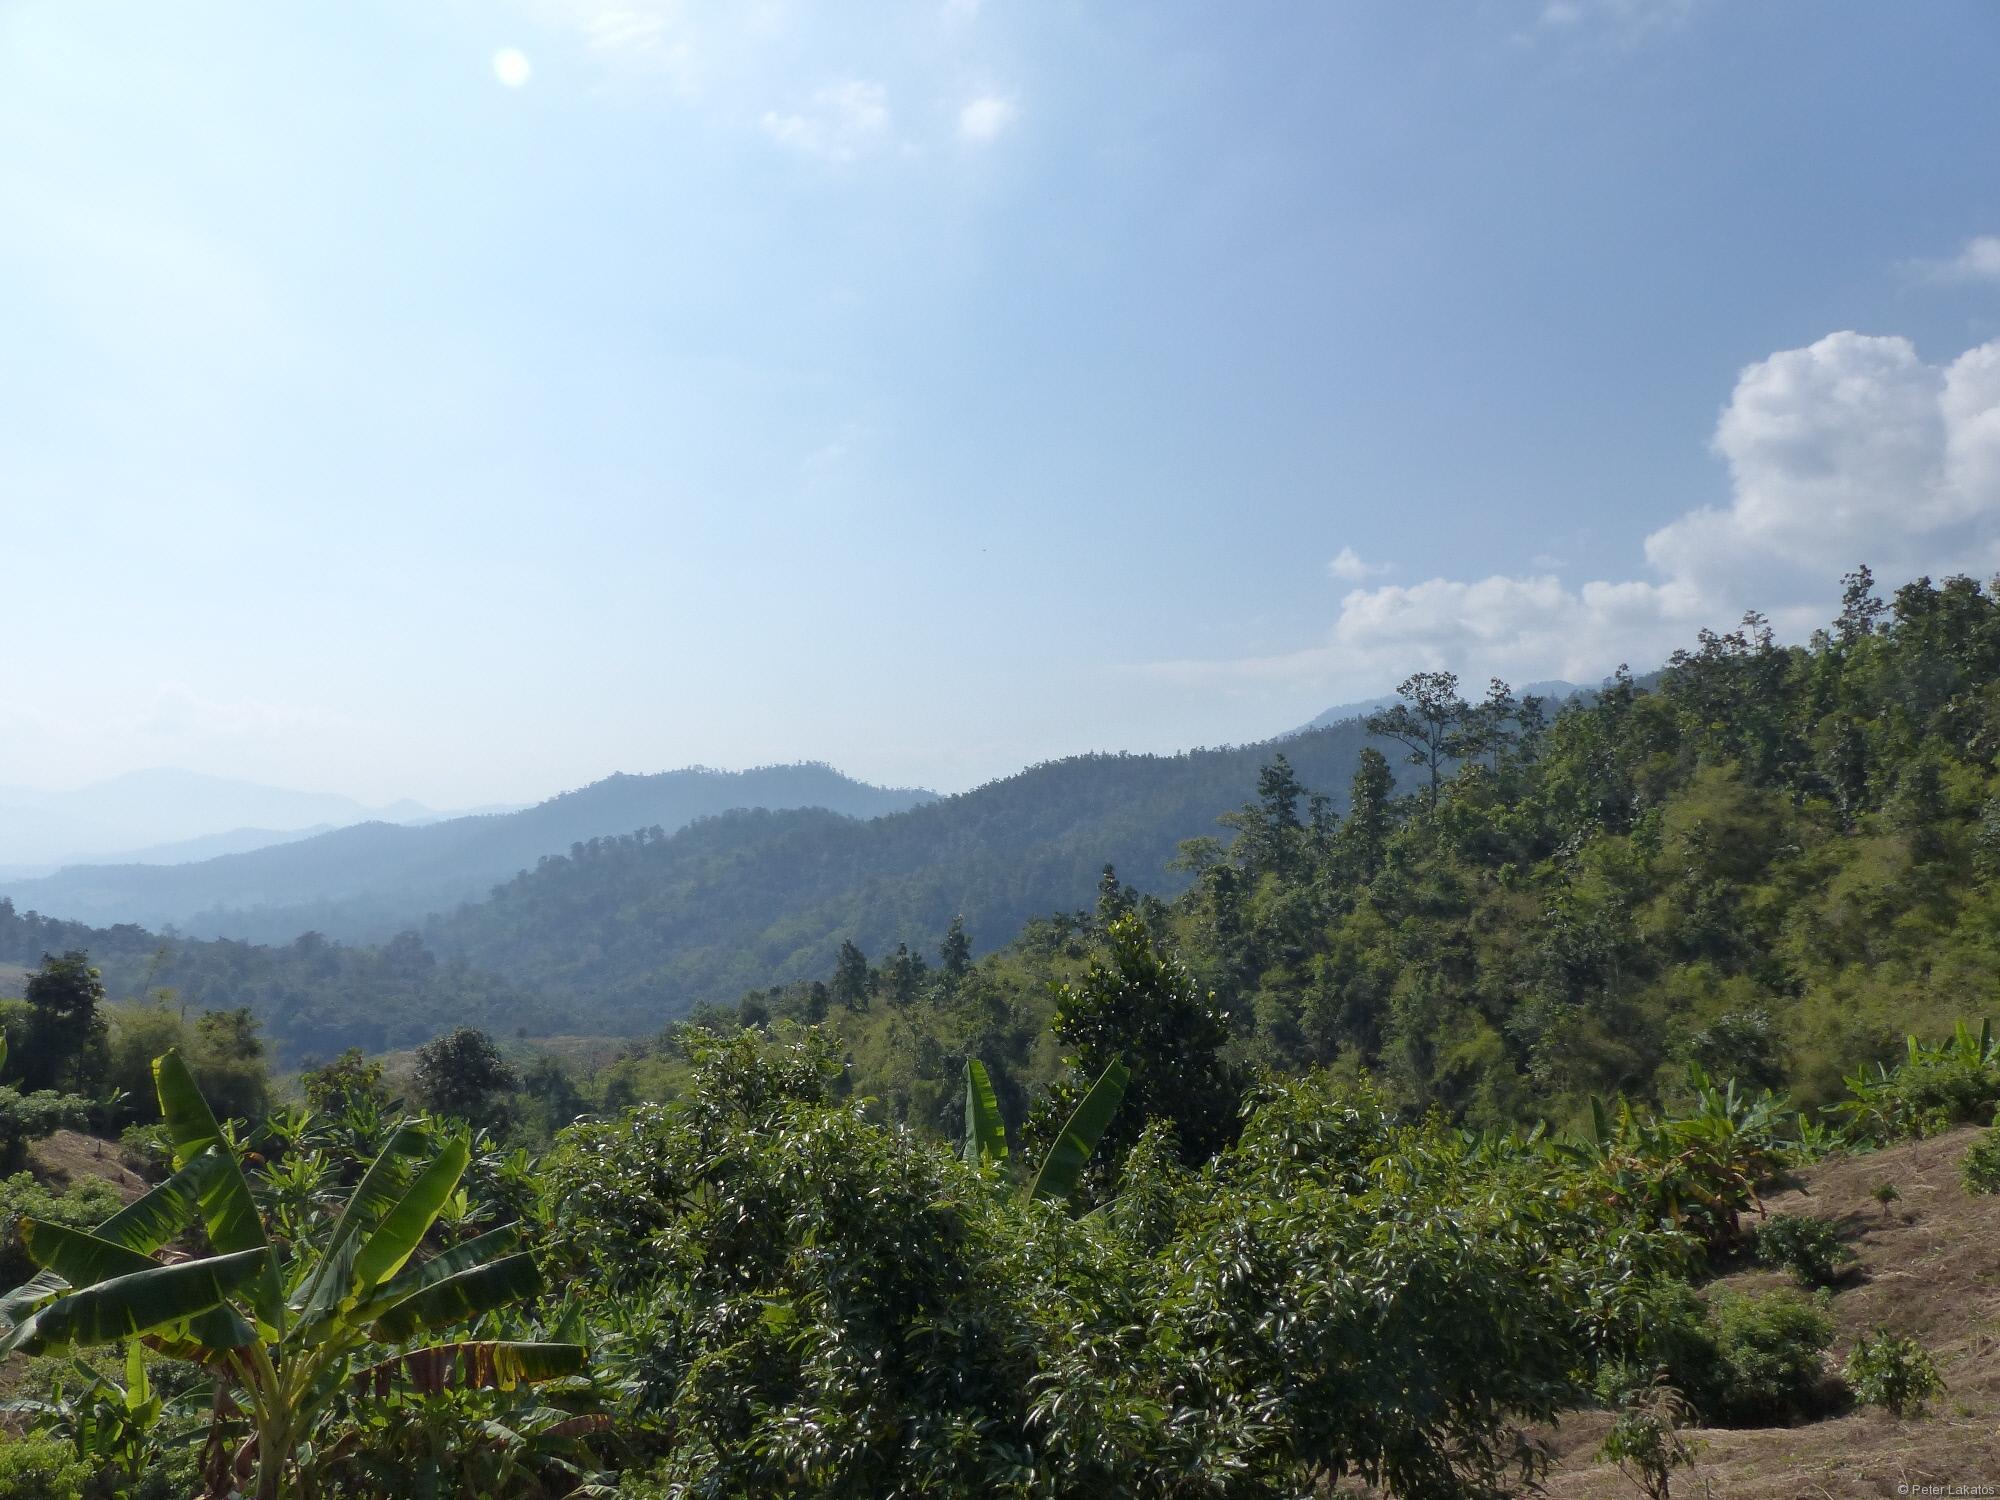 Yun Lai Aussichtspunkt